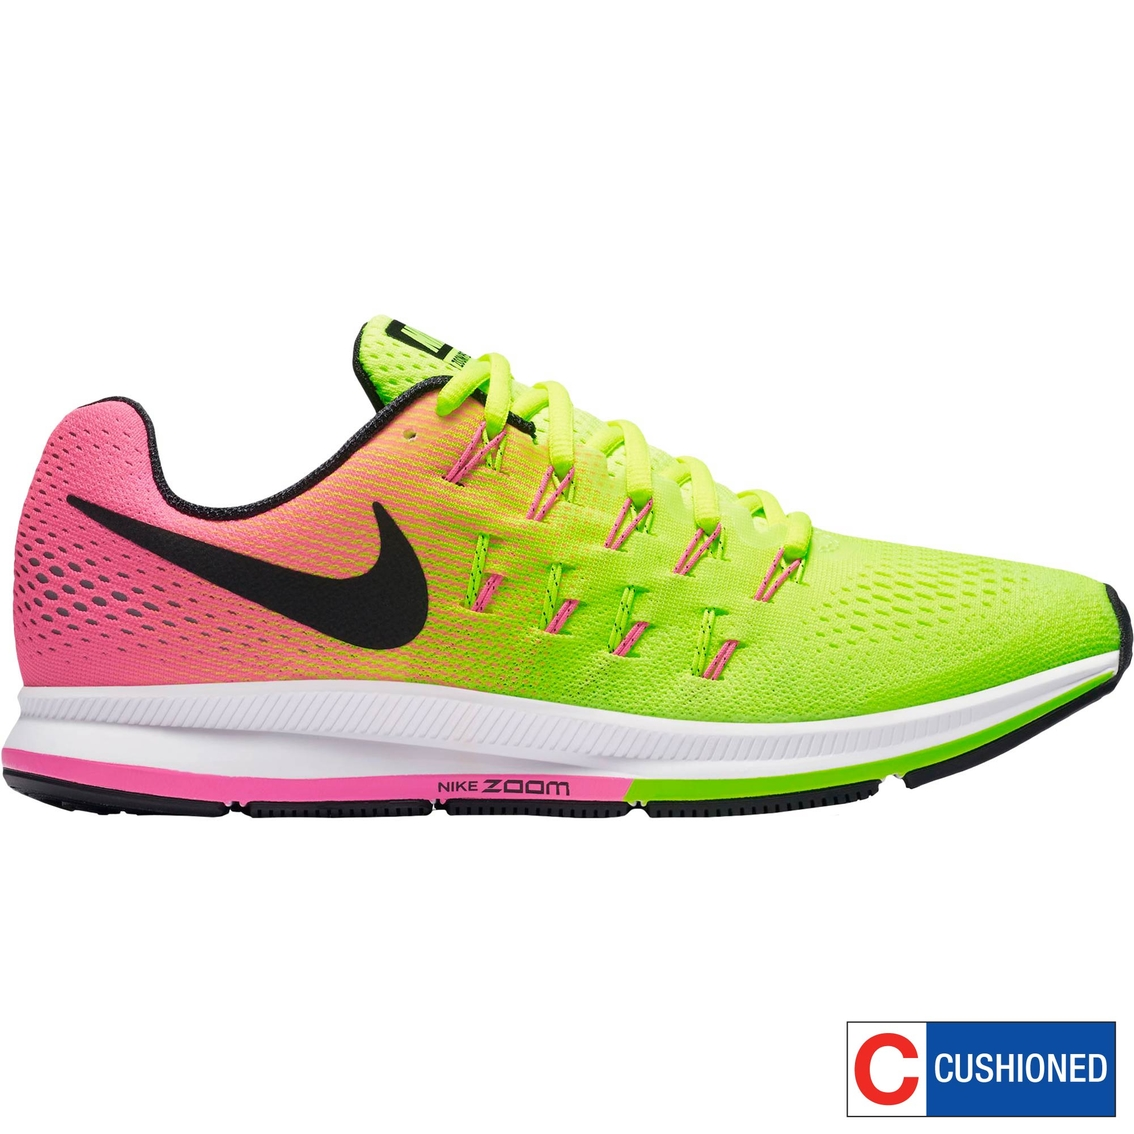 super popular 97882 79ed2 Nike Men's Air Zoom Pegasus 33 Oc | Running | Shoes | Shop ...